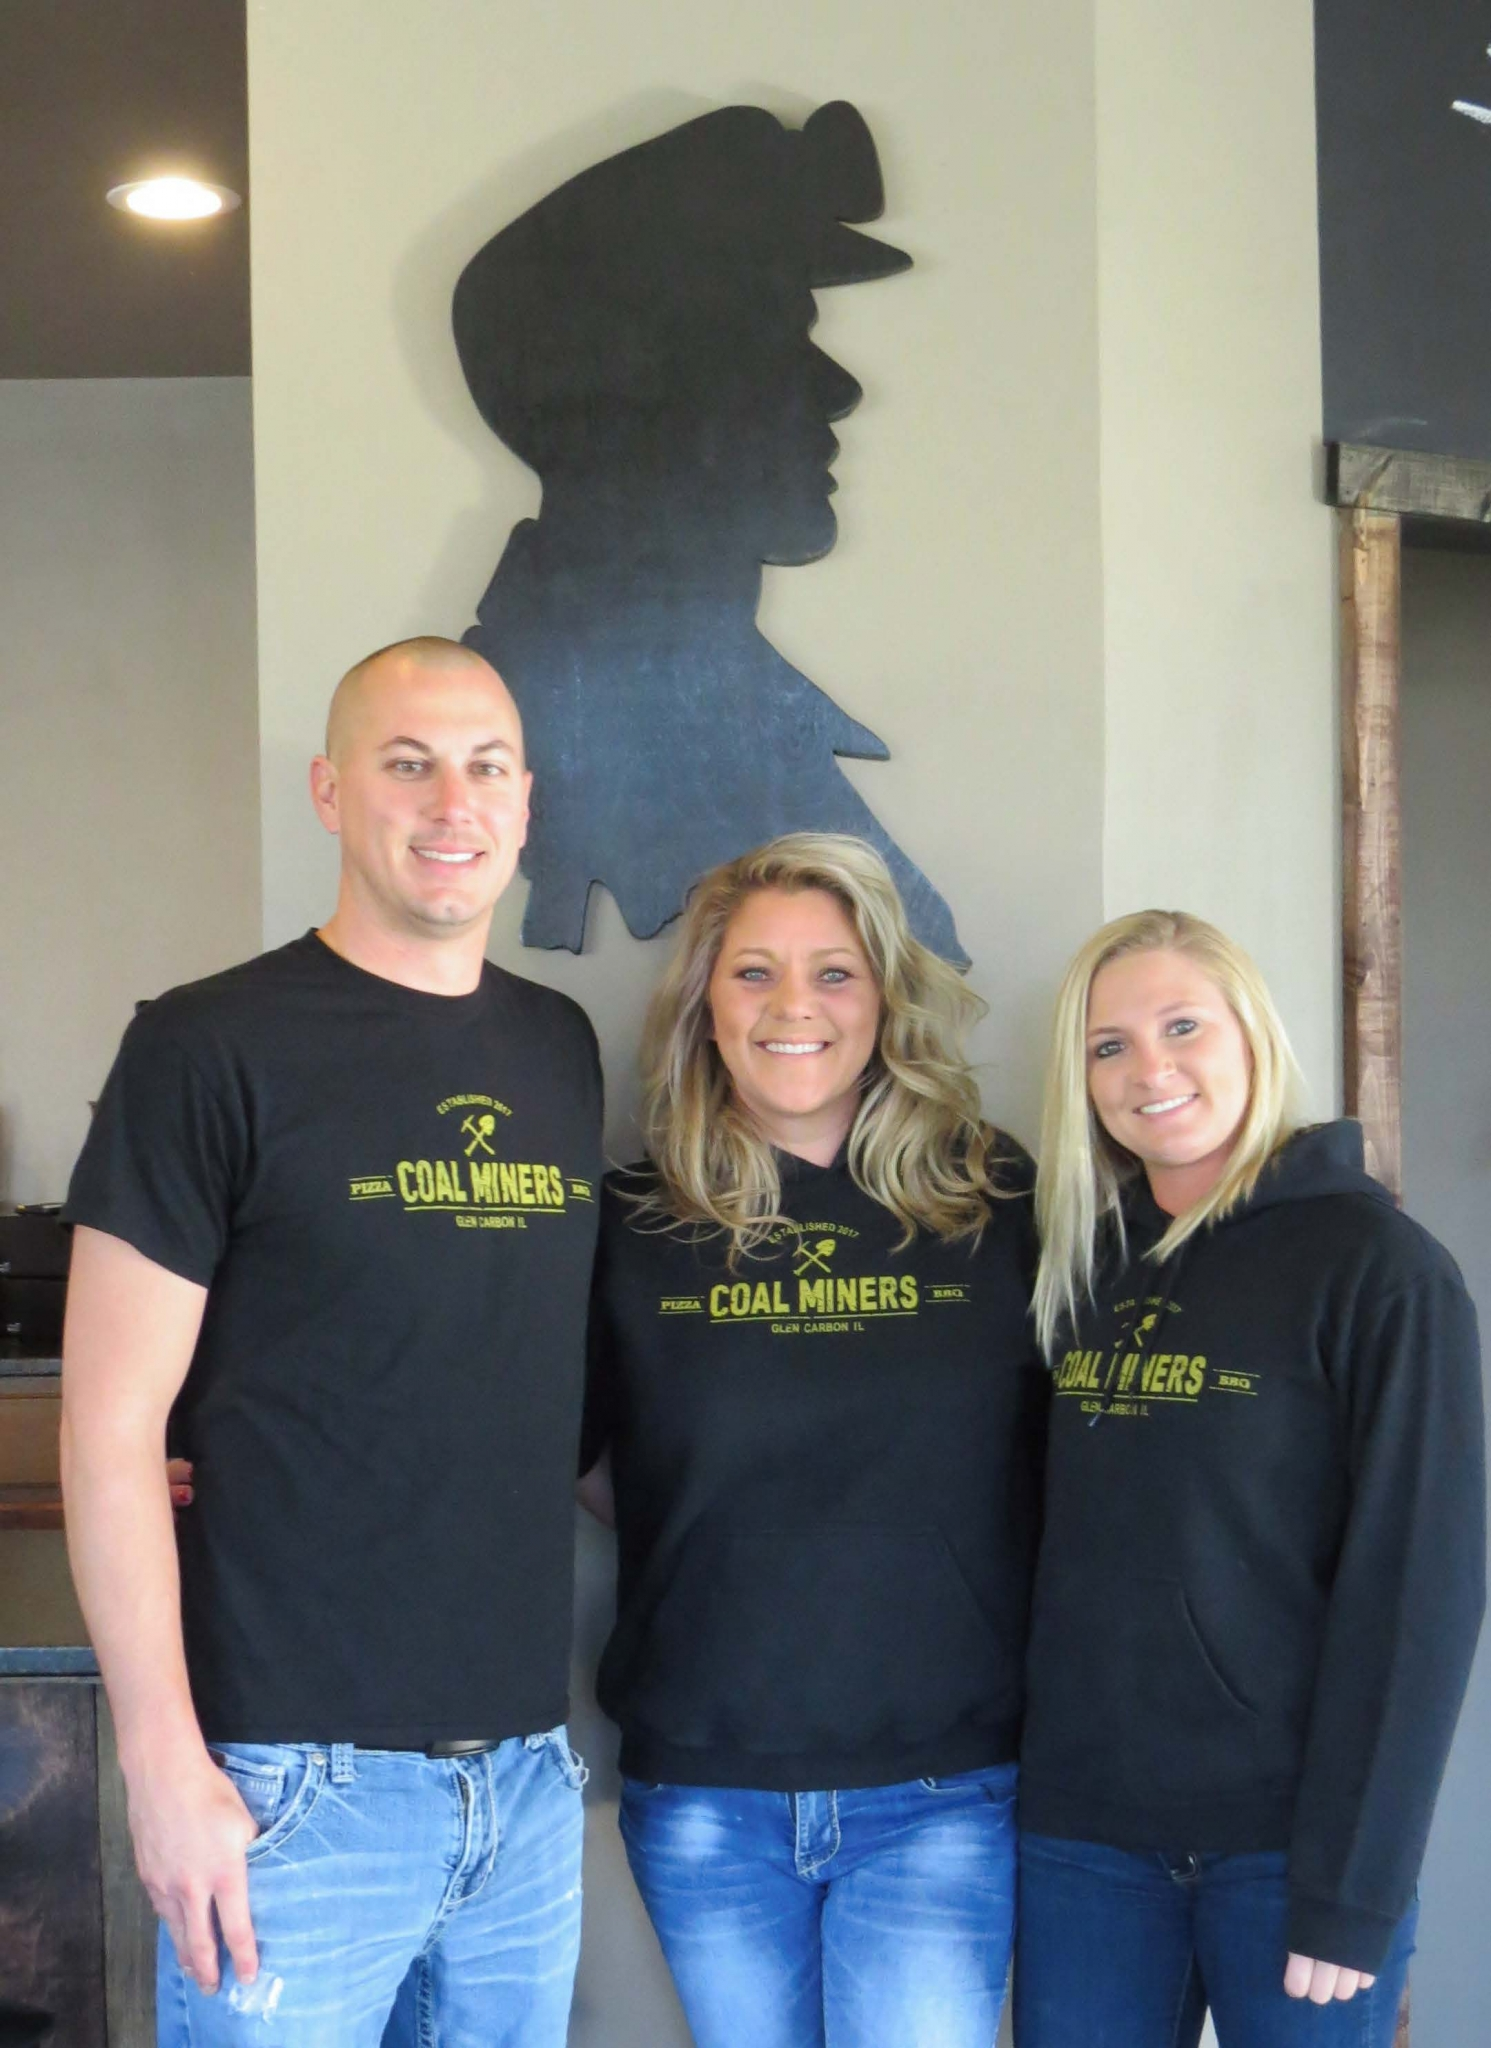 New Restaurant Opens In Glen Carbon The Edwardsville Intelligencer